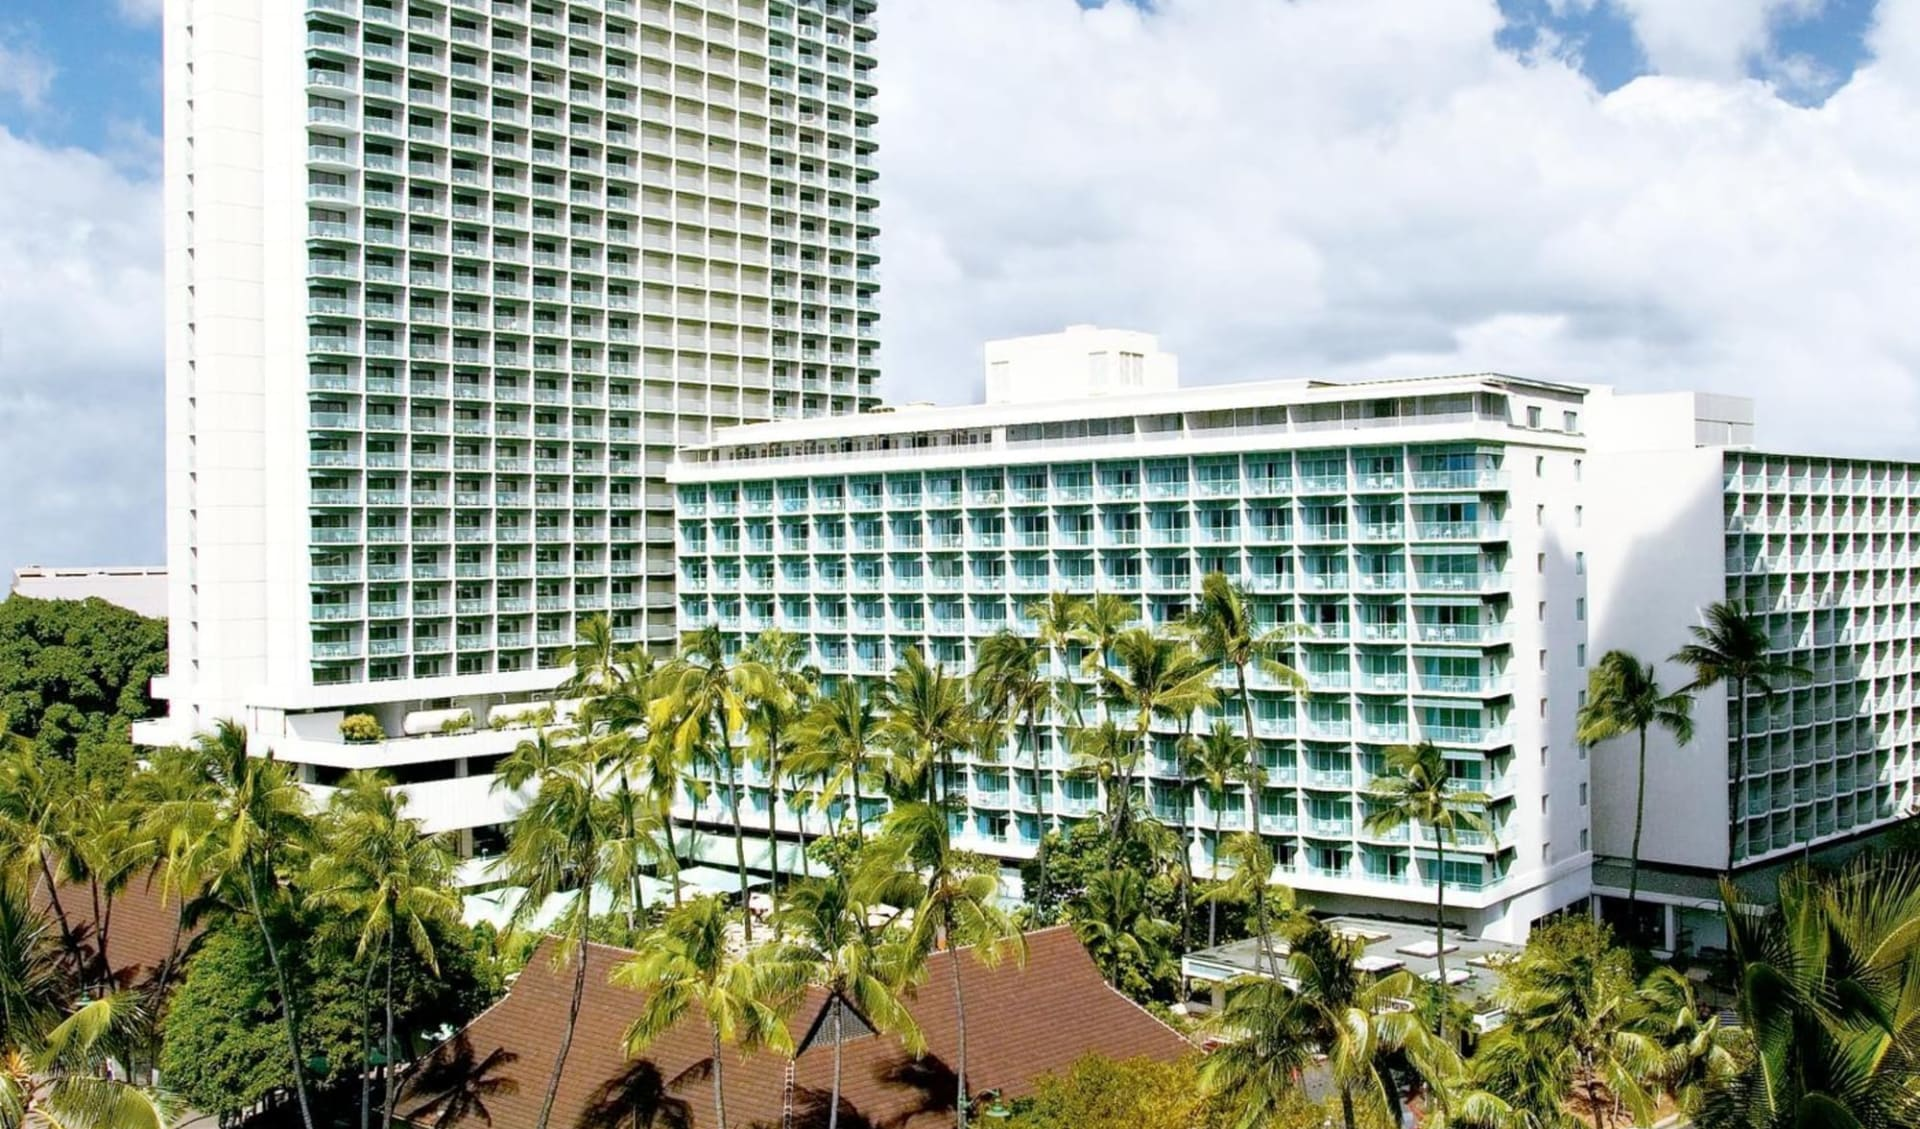 Sheraton Princess Kaiulani in Honolulu - Oahu: Exterior_Sheraton Princess Kaiulani_Aussenansicht_Bonotel